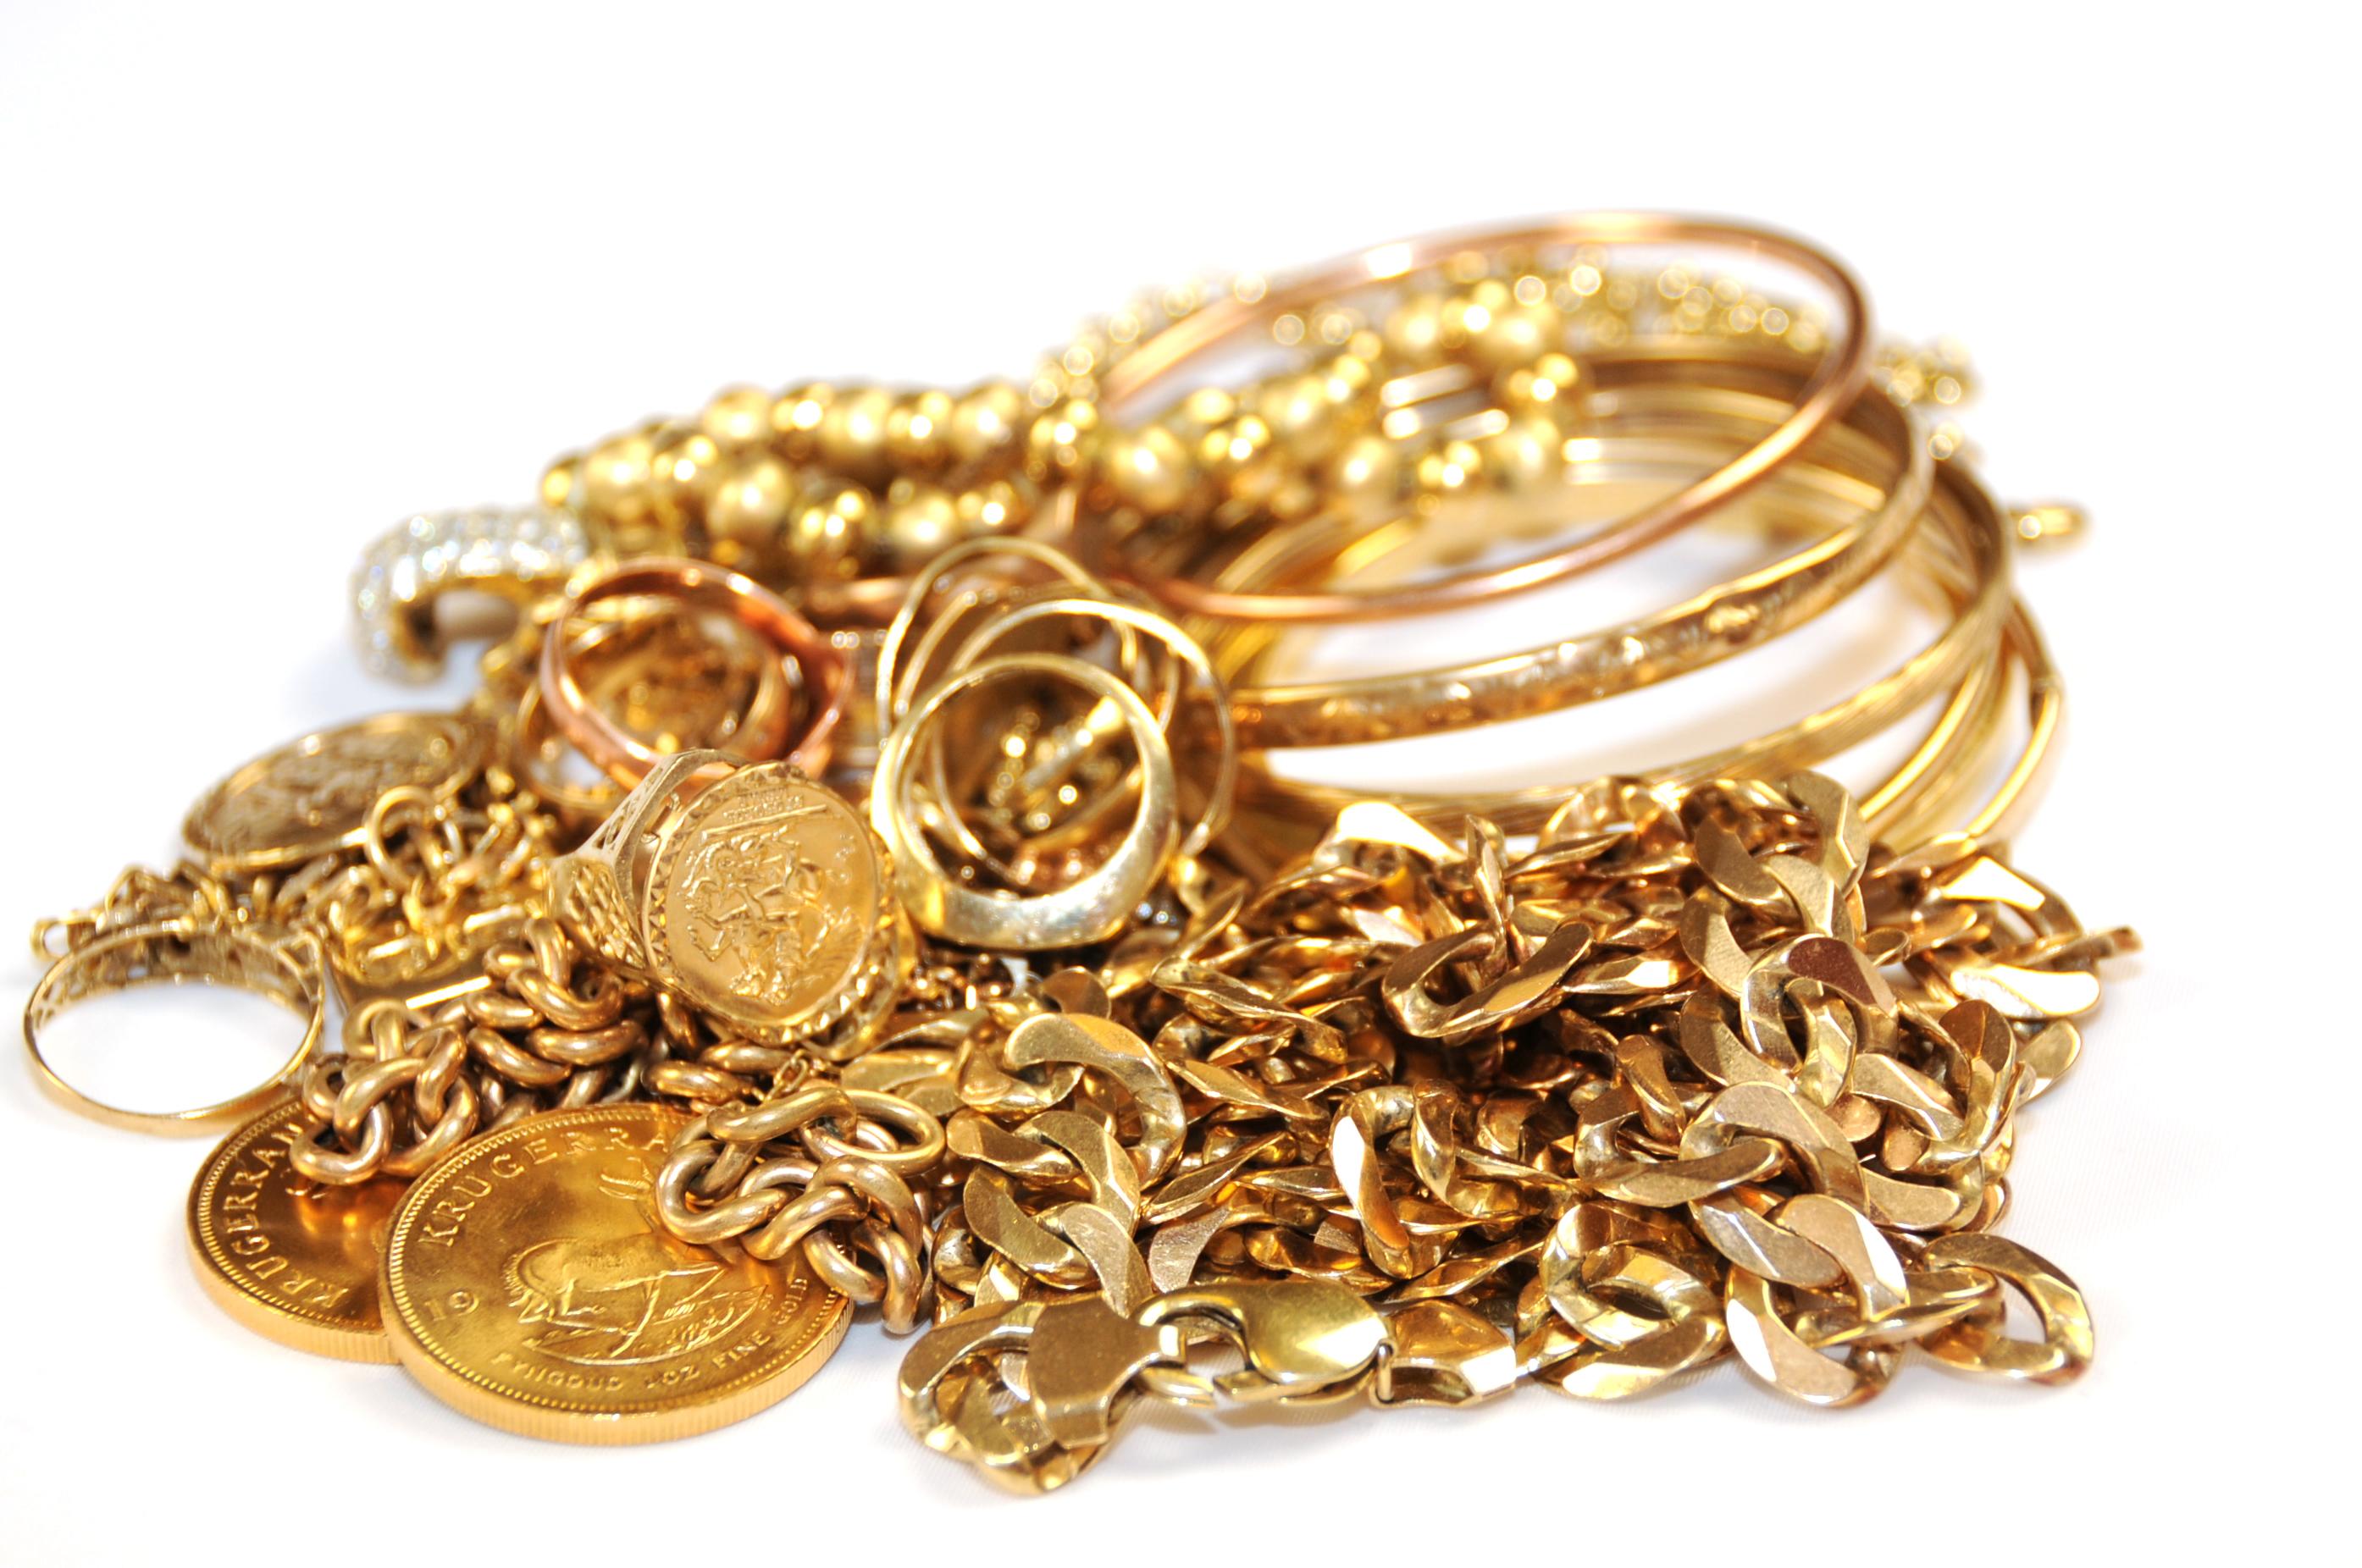 Cash-for-scrap-designer-jewelry-richmond-va